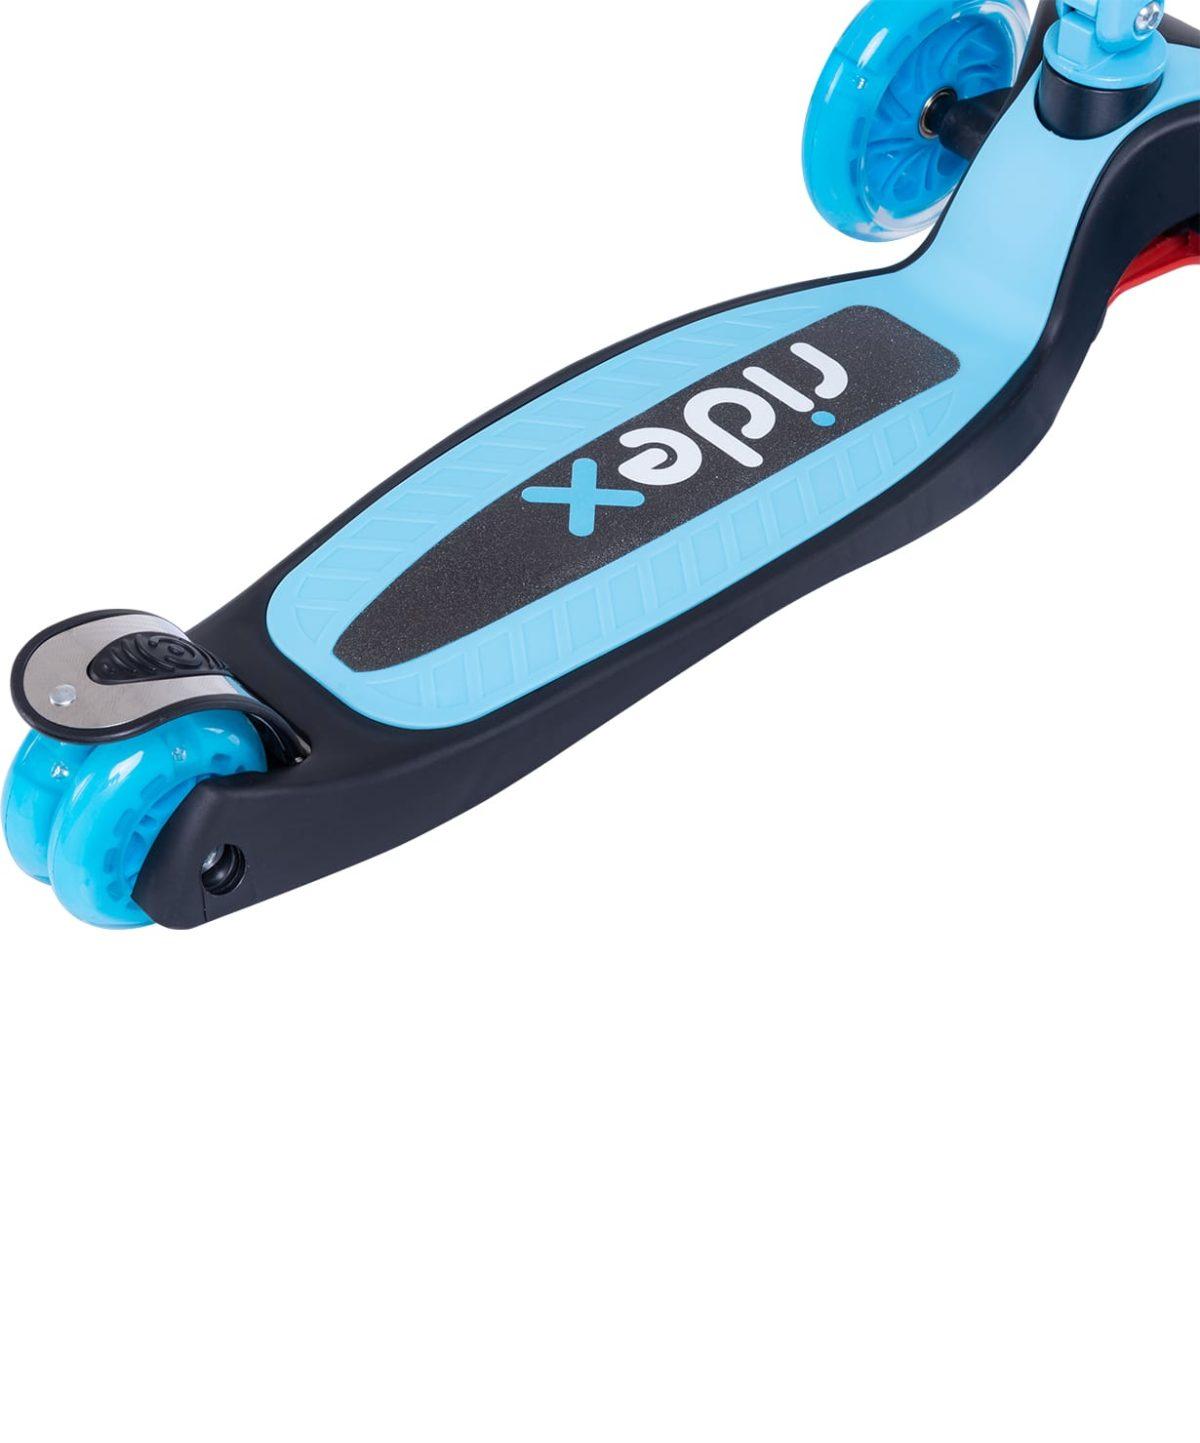 RIDEX 3D Tiny Tot Самокат 3-колесный Tiny Tot 120/80 мм  Tiny Tot: голубой - 4